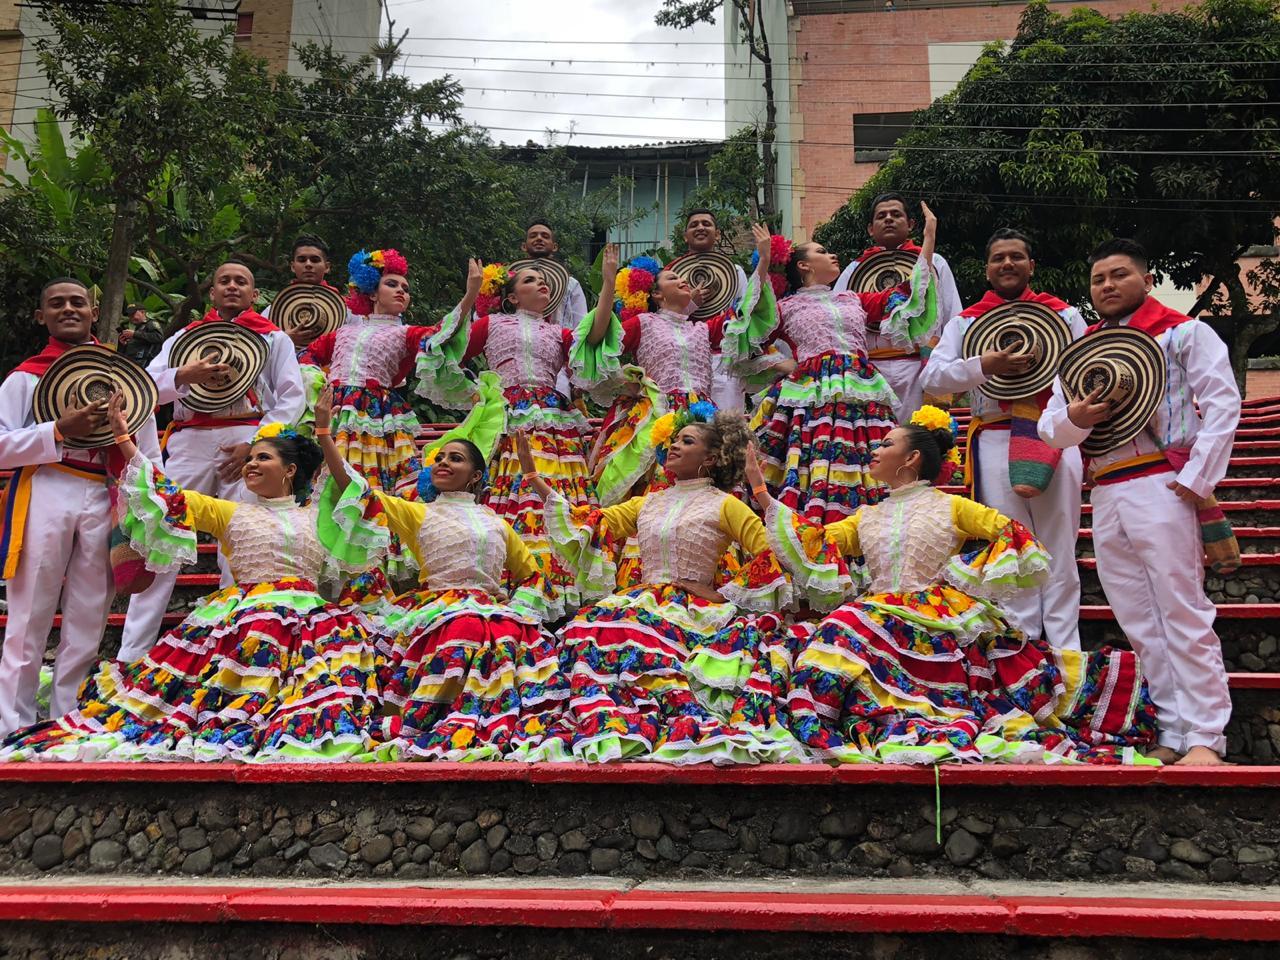 Colombia bailó al ritmo del Carnaval de Barranquilla